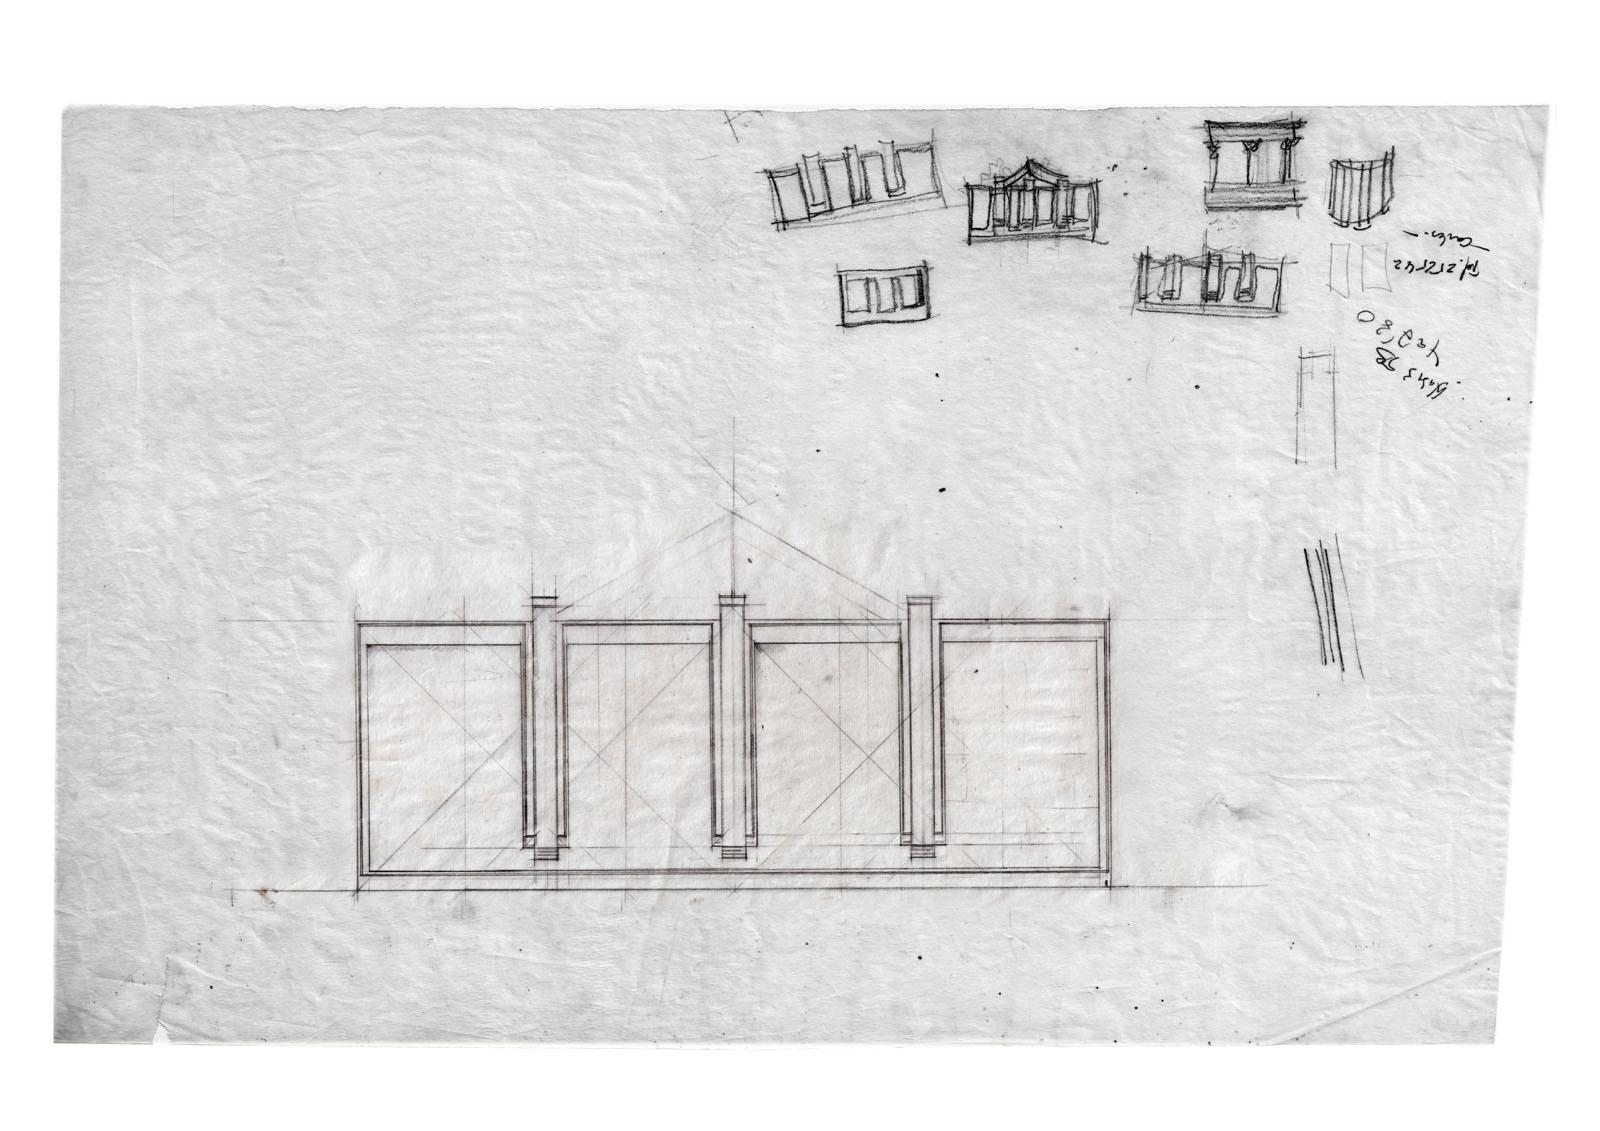 danielvillalobos-architecturexxthcentury-spanisharchitecture-schoolarchitectureproject-13